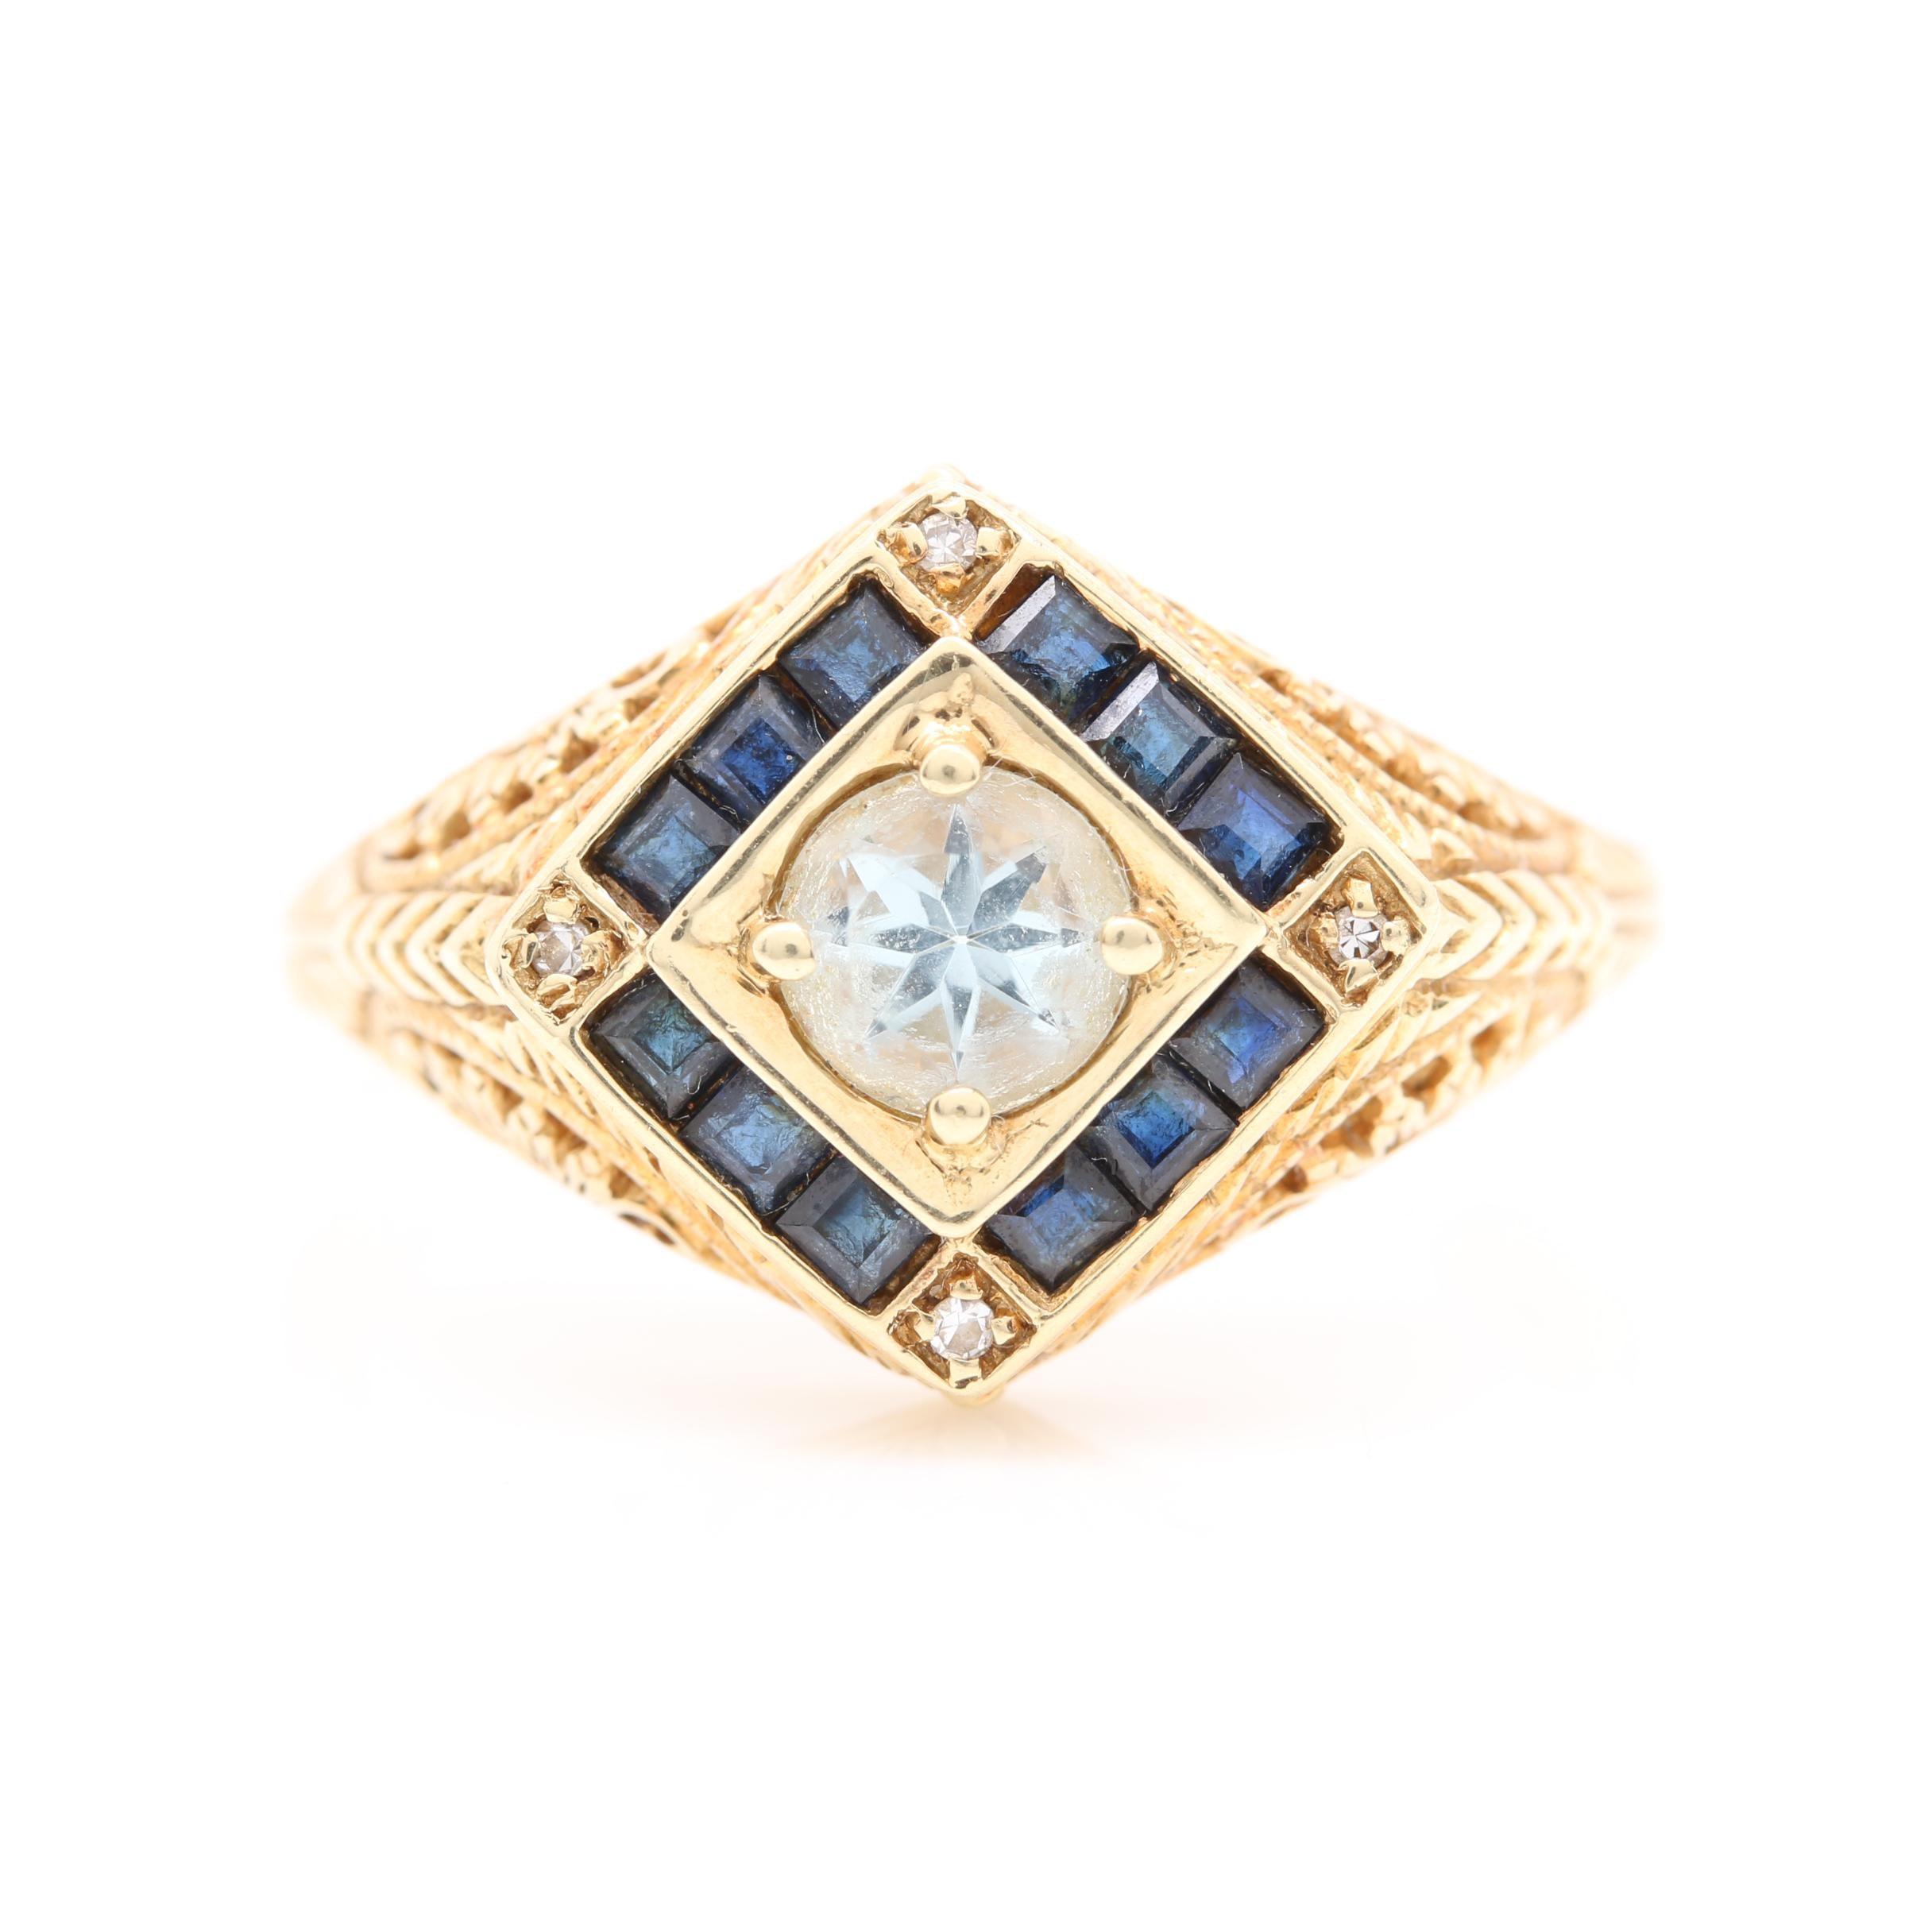 14K Yellow Gold Gadolinium Gallium Garnet, Sapphire, and Diamond Ring